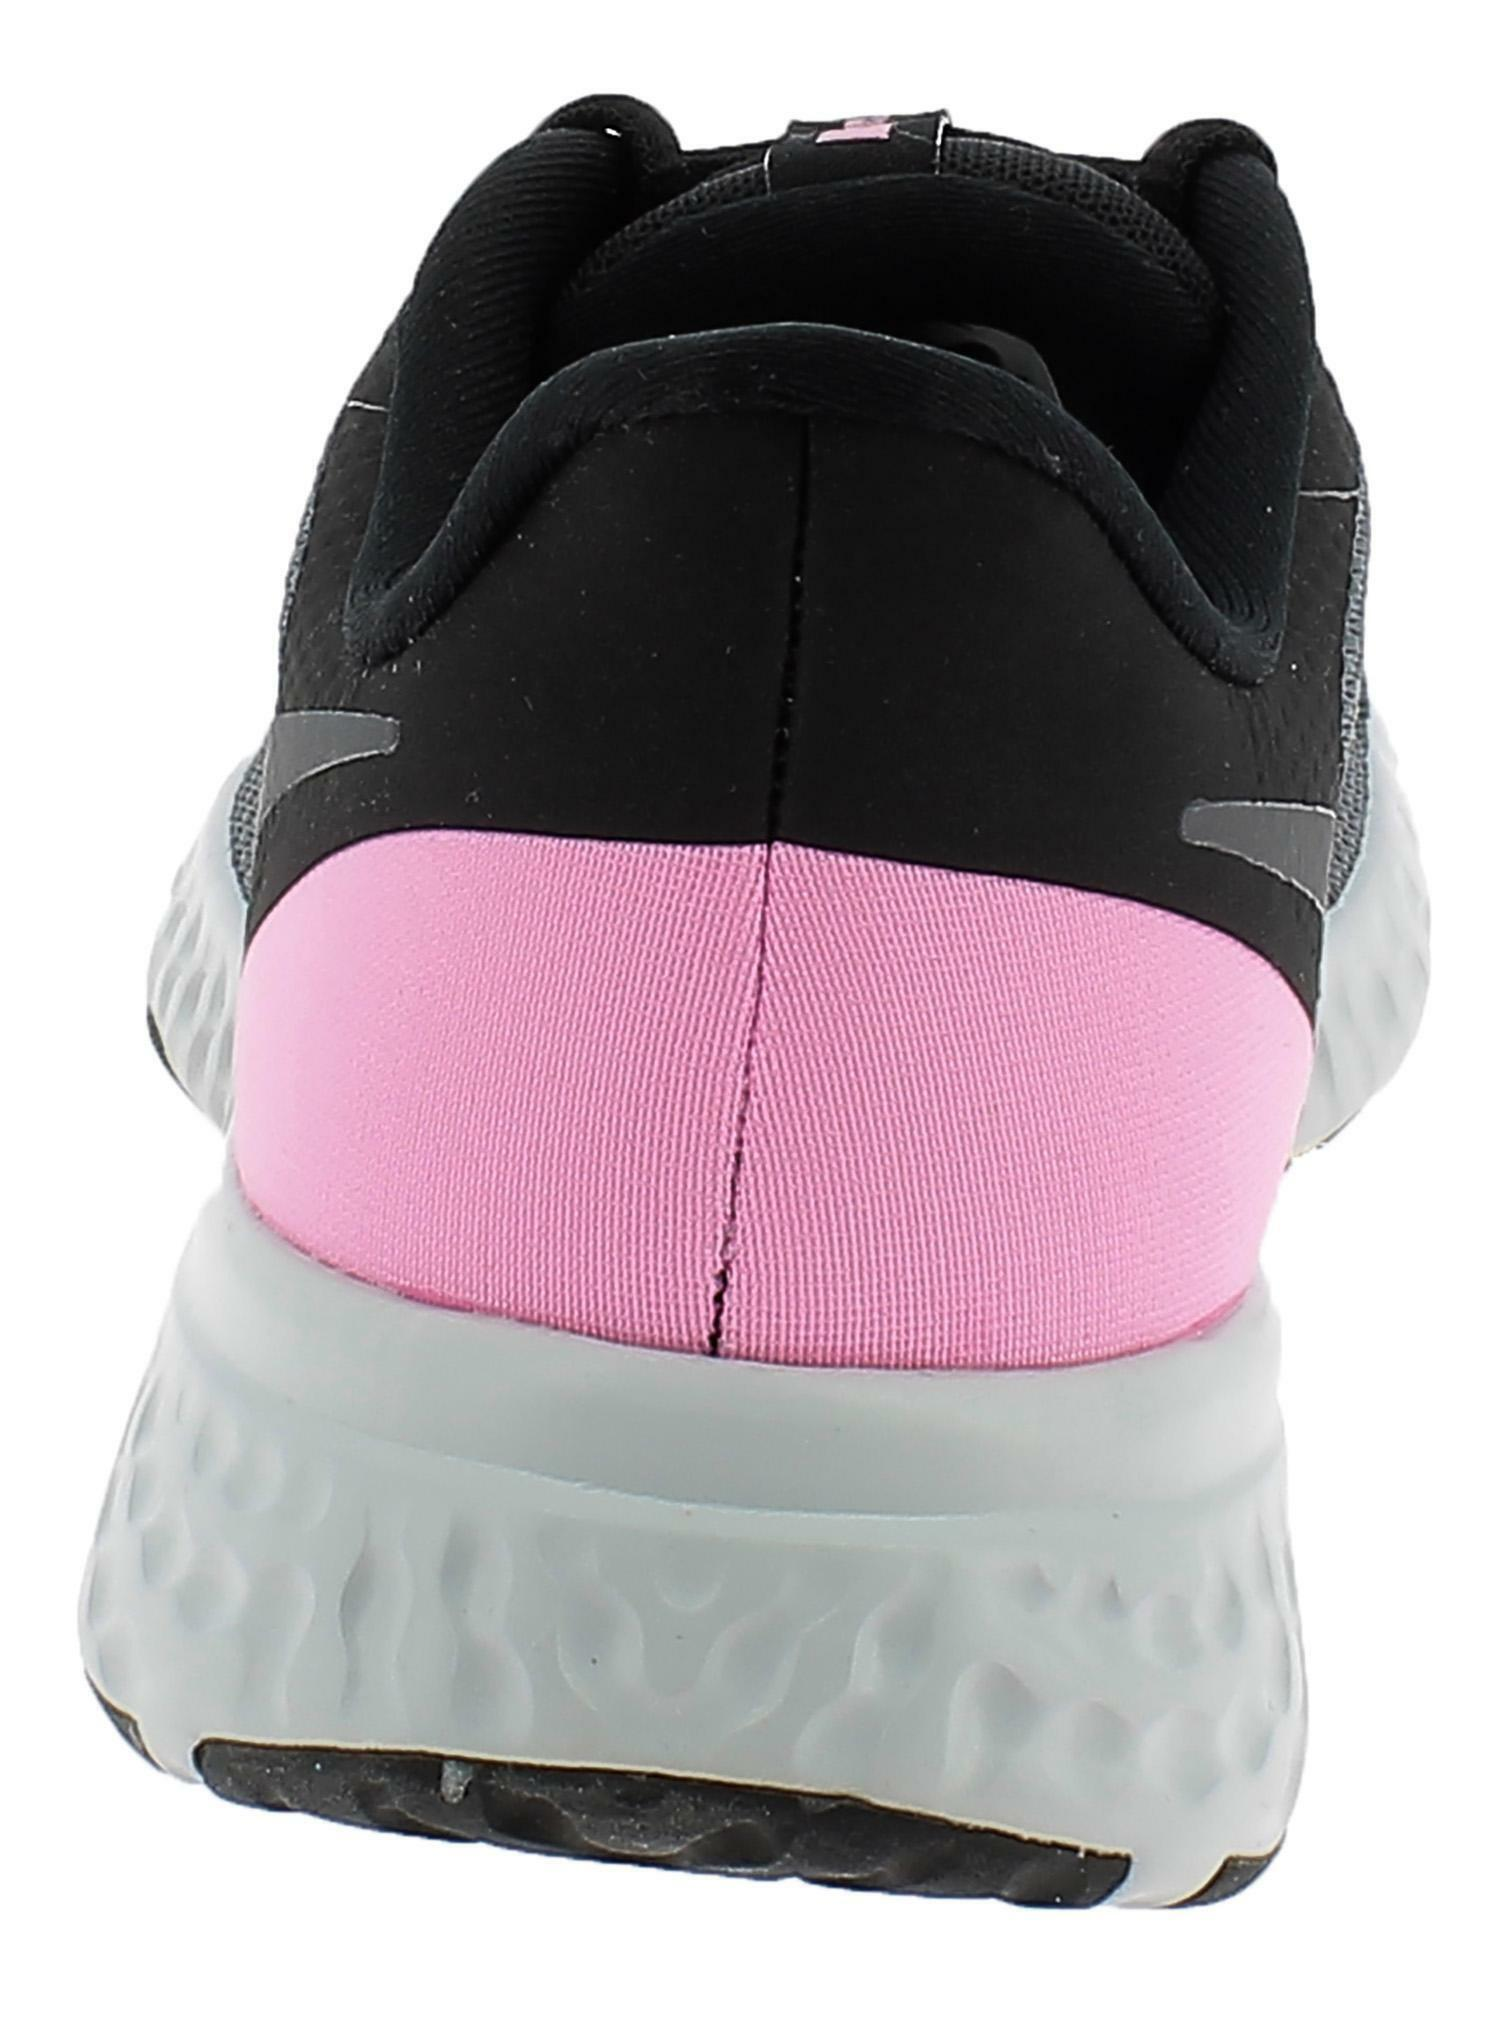 Nike revolution 5 scarpe sportive donna grigie bq3207004  4GqU3b